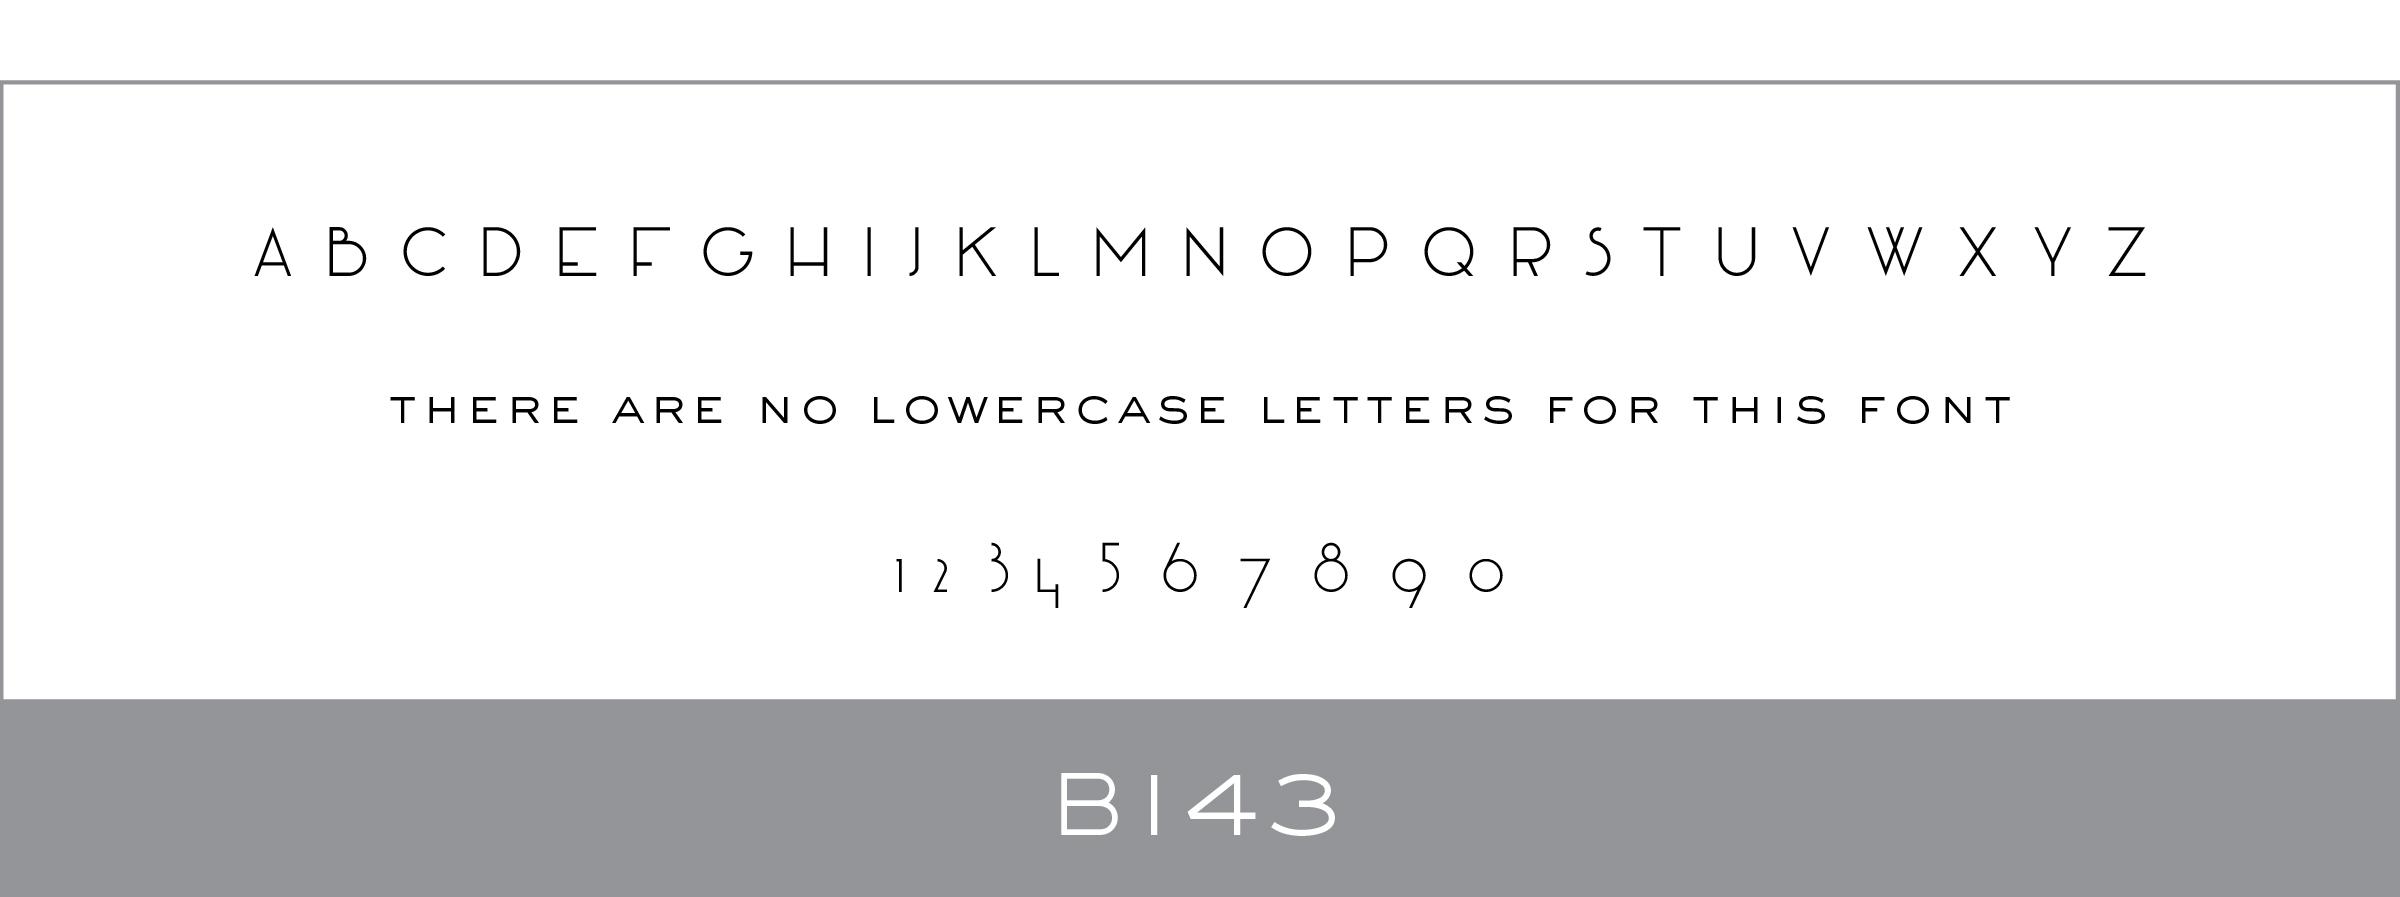 B143_Haute_Papier_Font.jpg